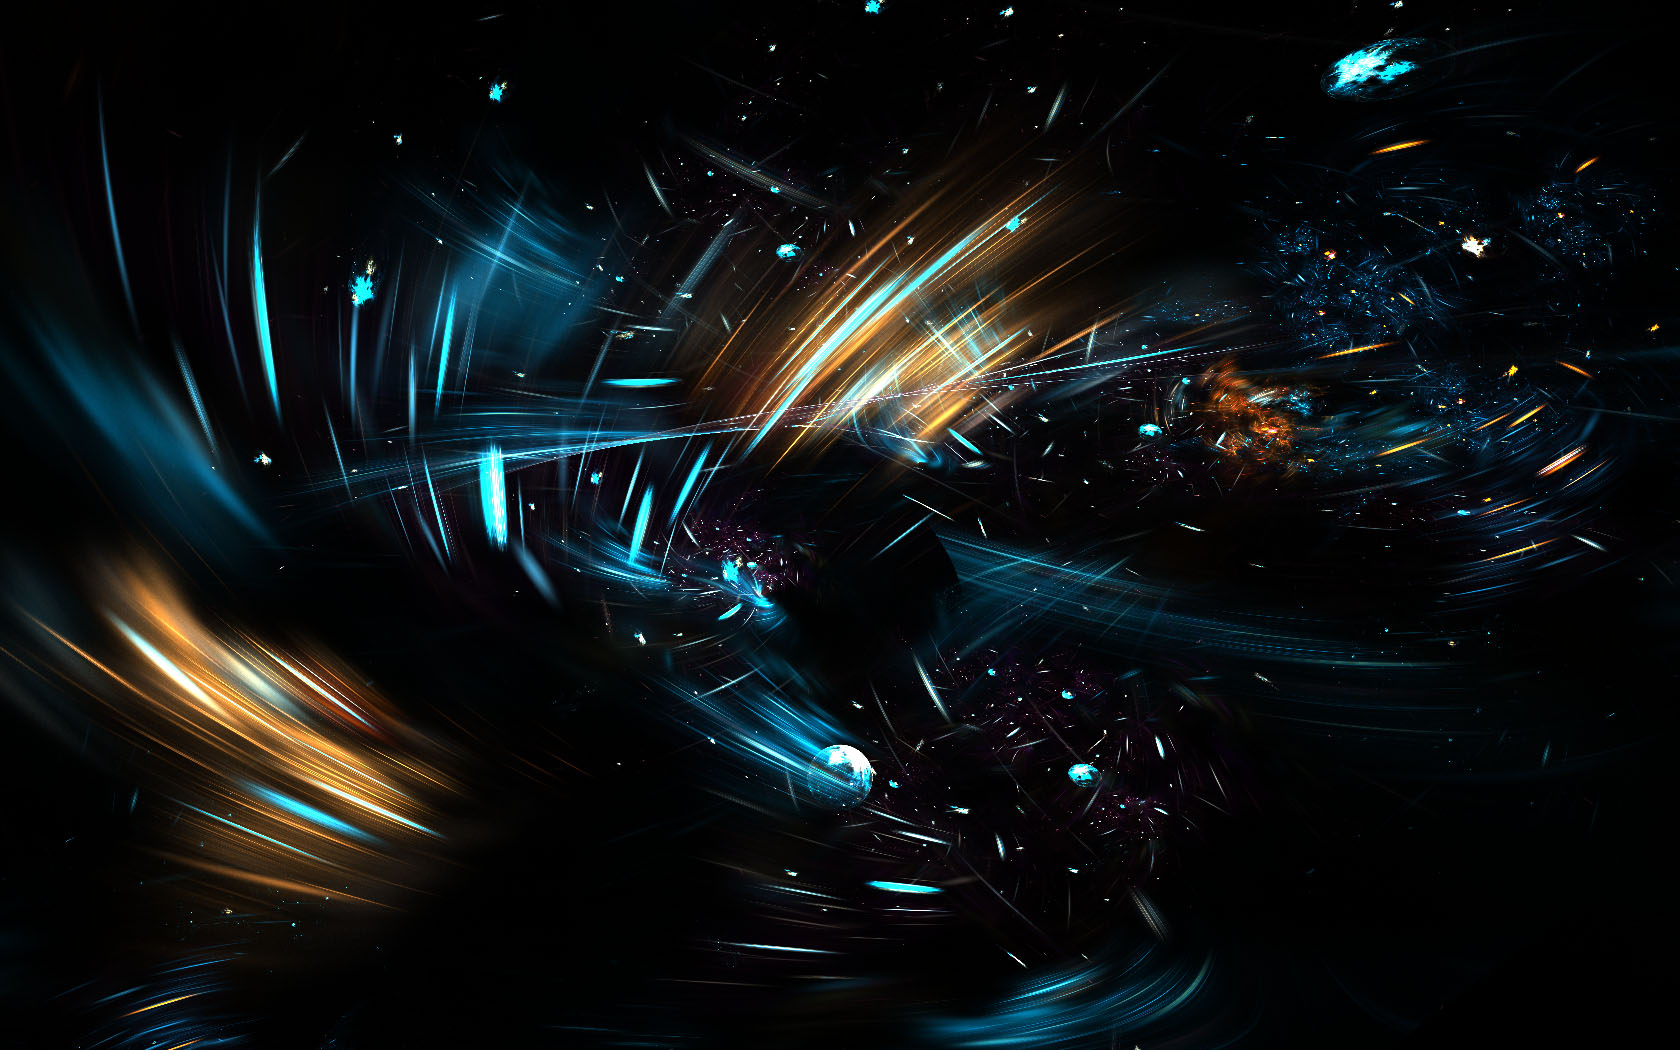 Pics photos hd wallpapers epic desktop s - Epic Space Wallpapers Hd 1680x1050 Iwallhd Wallpaper Hd